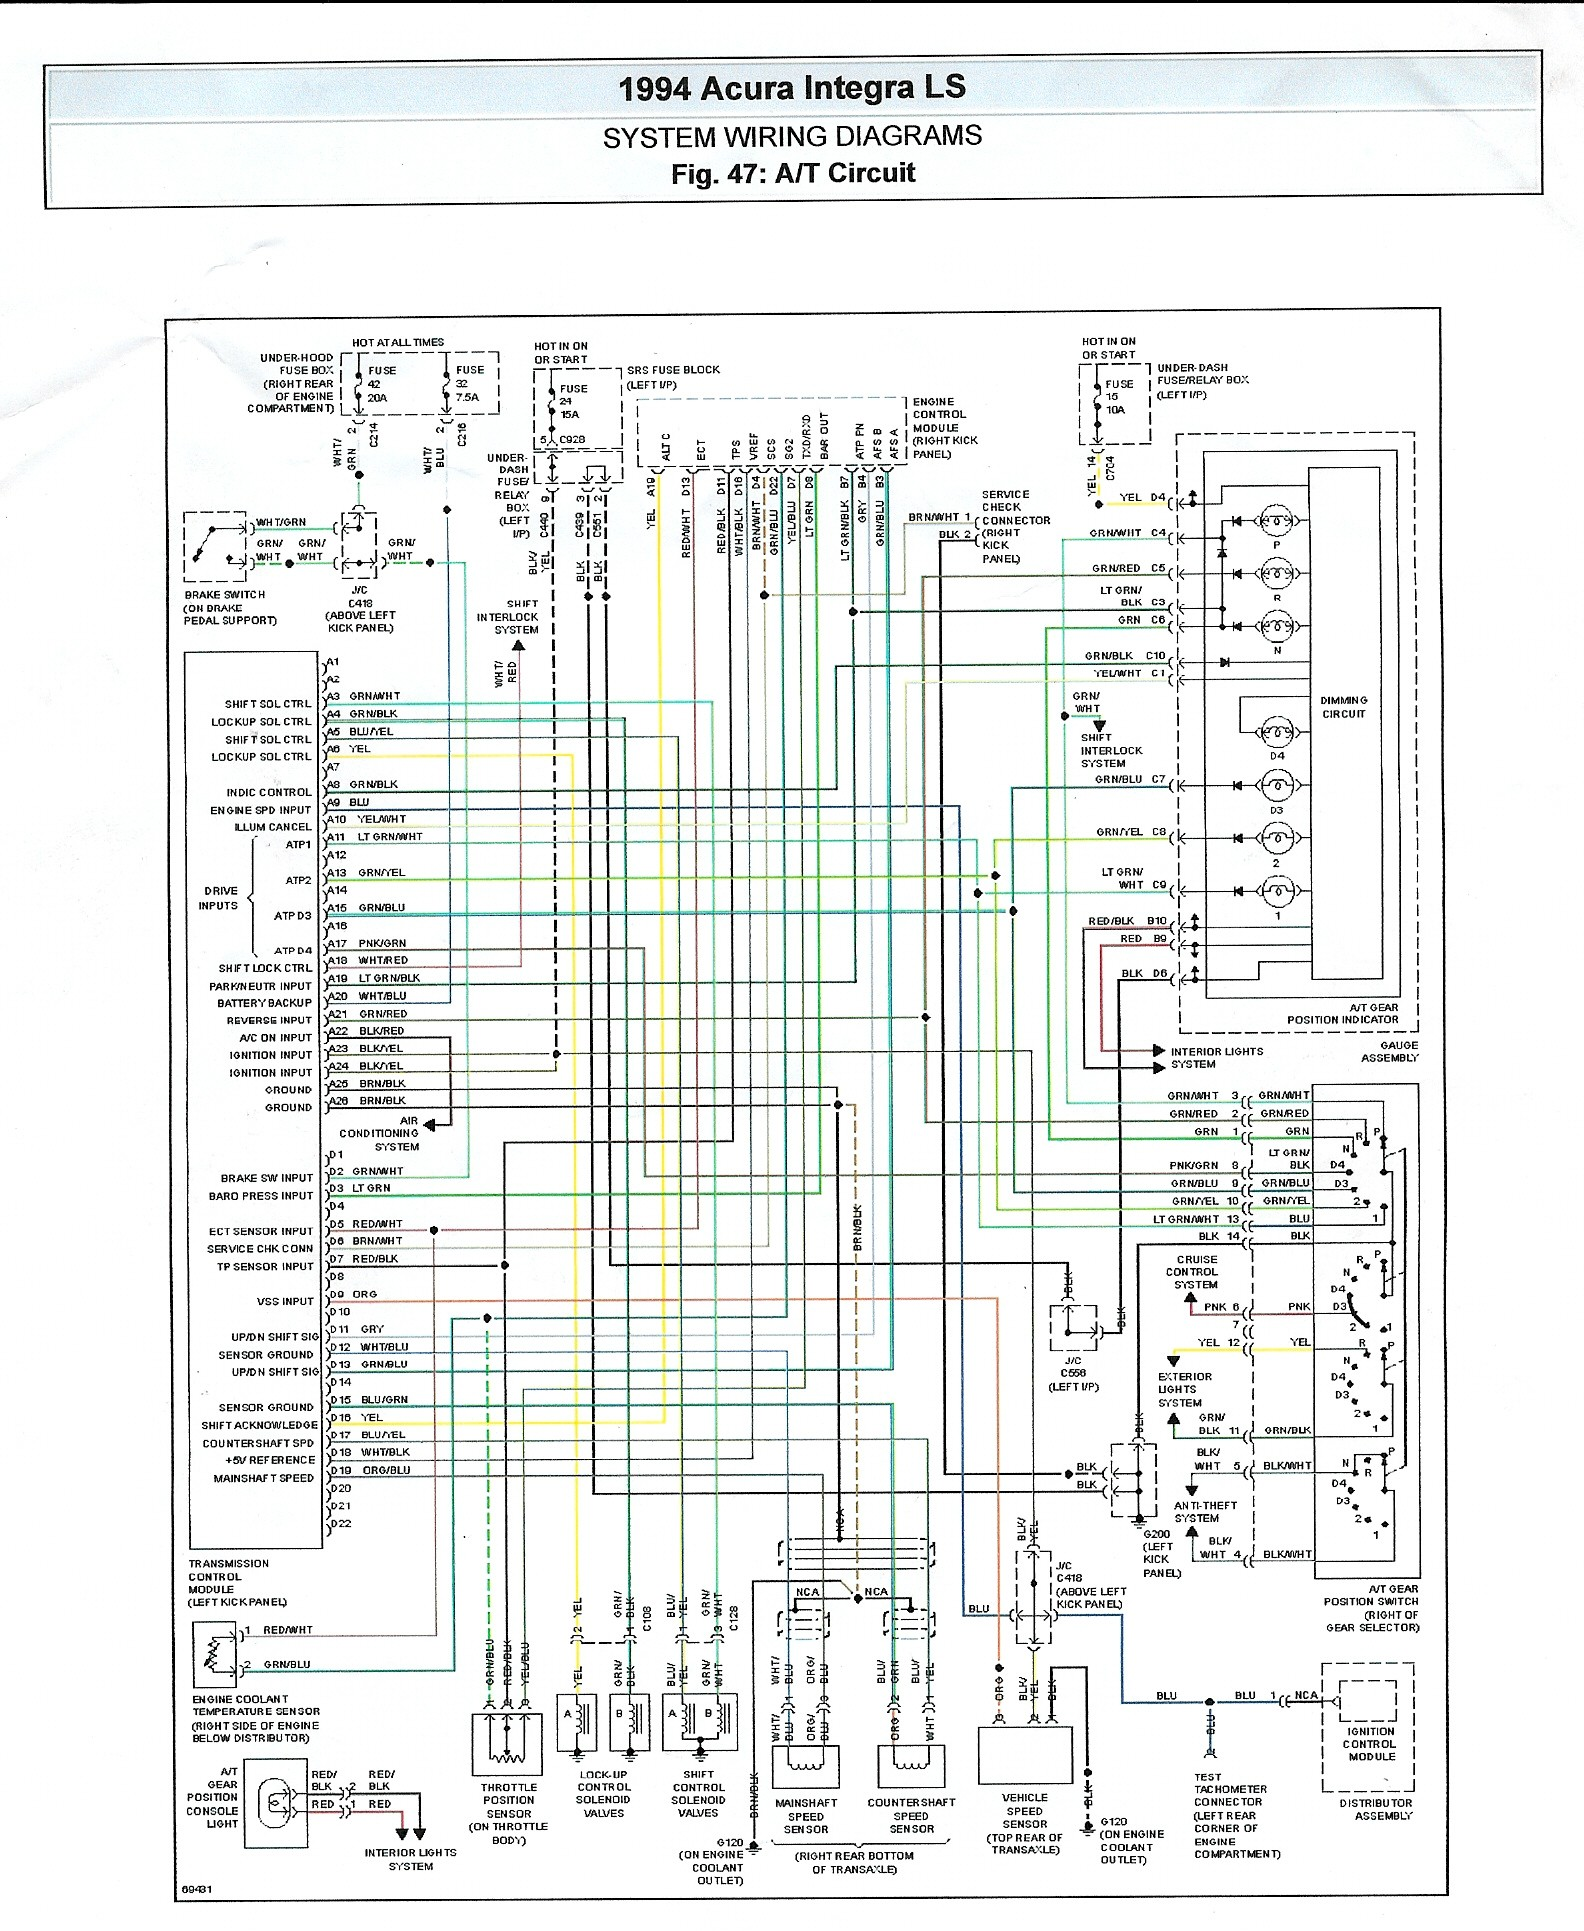 Honda Vtec Obd1 Wiring Diagram Trusted Engine Harness Civic Alternator 92 95 Integra